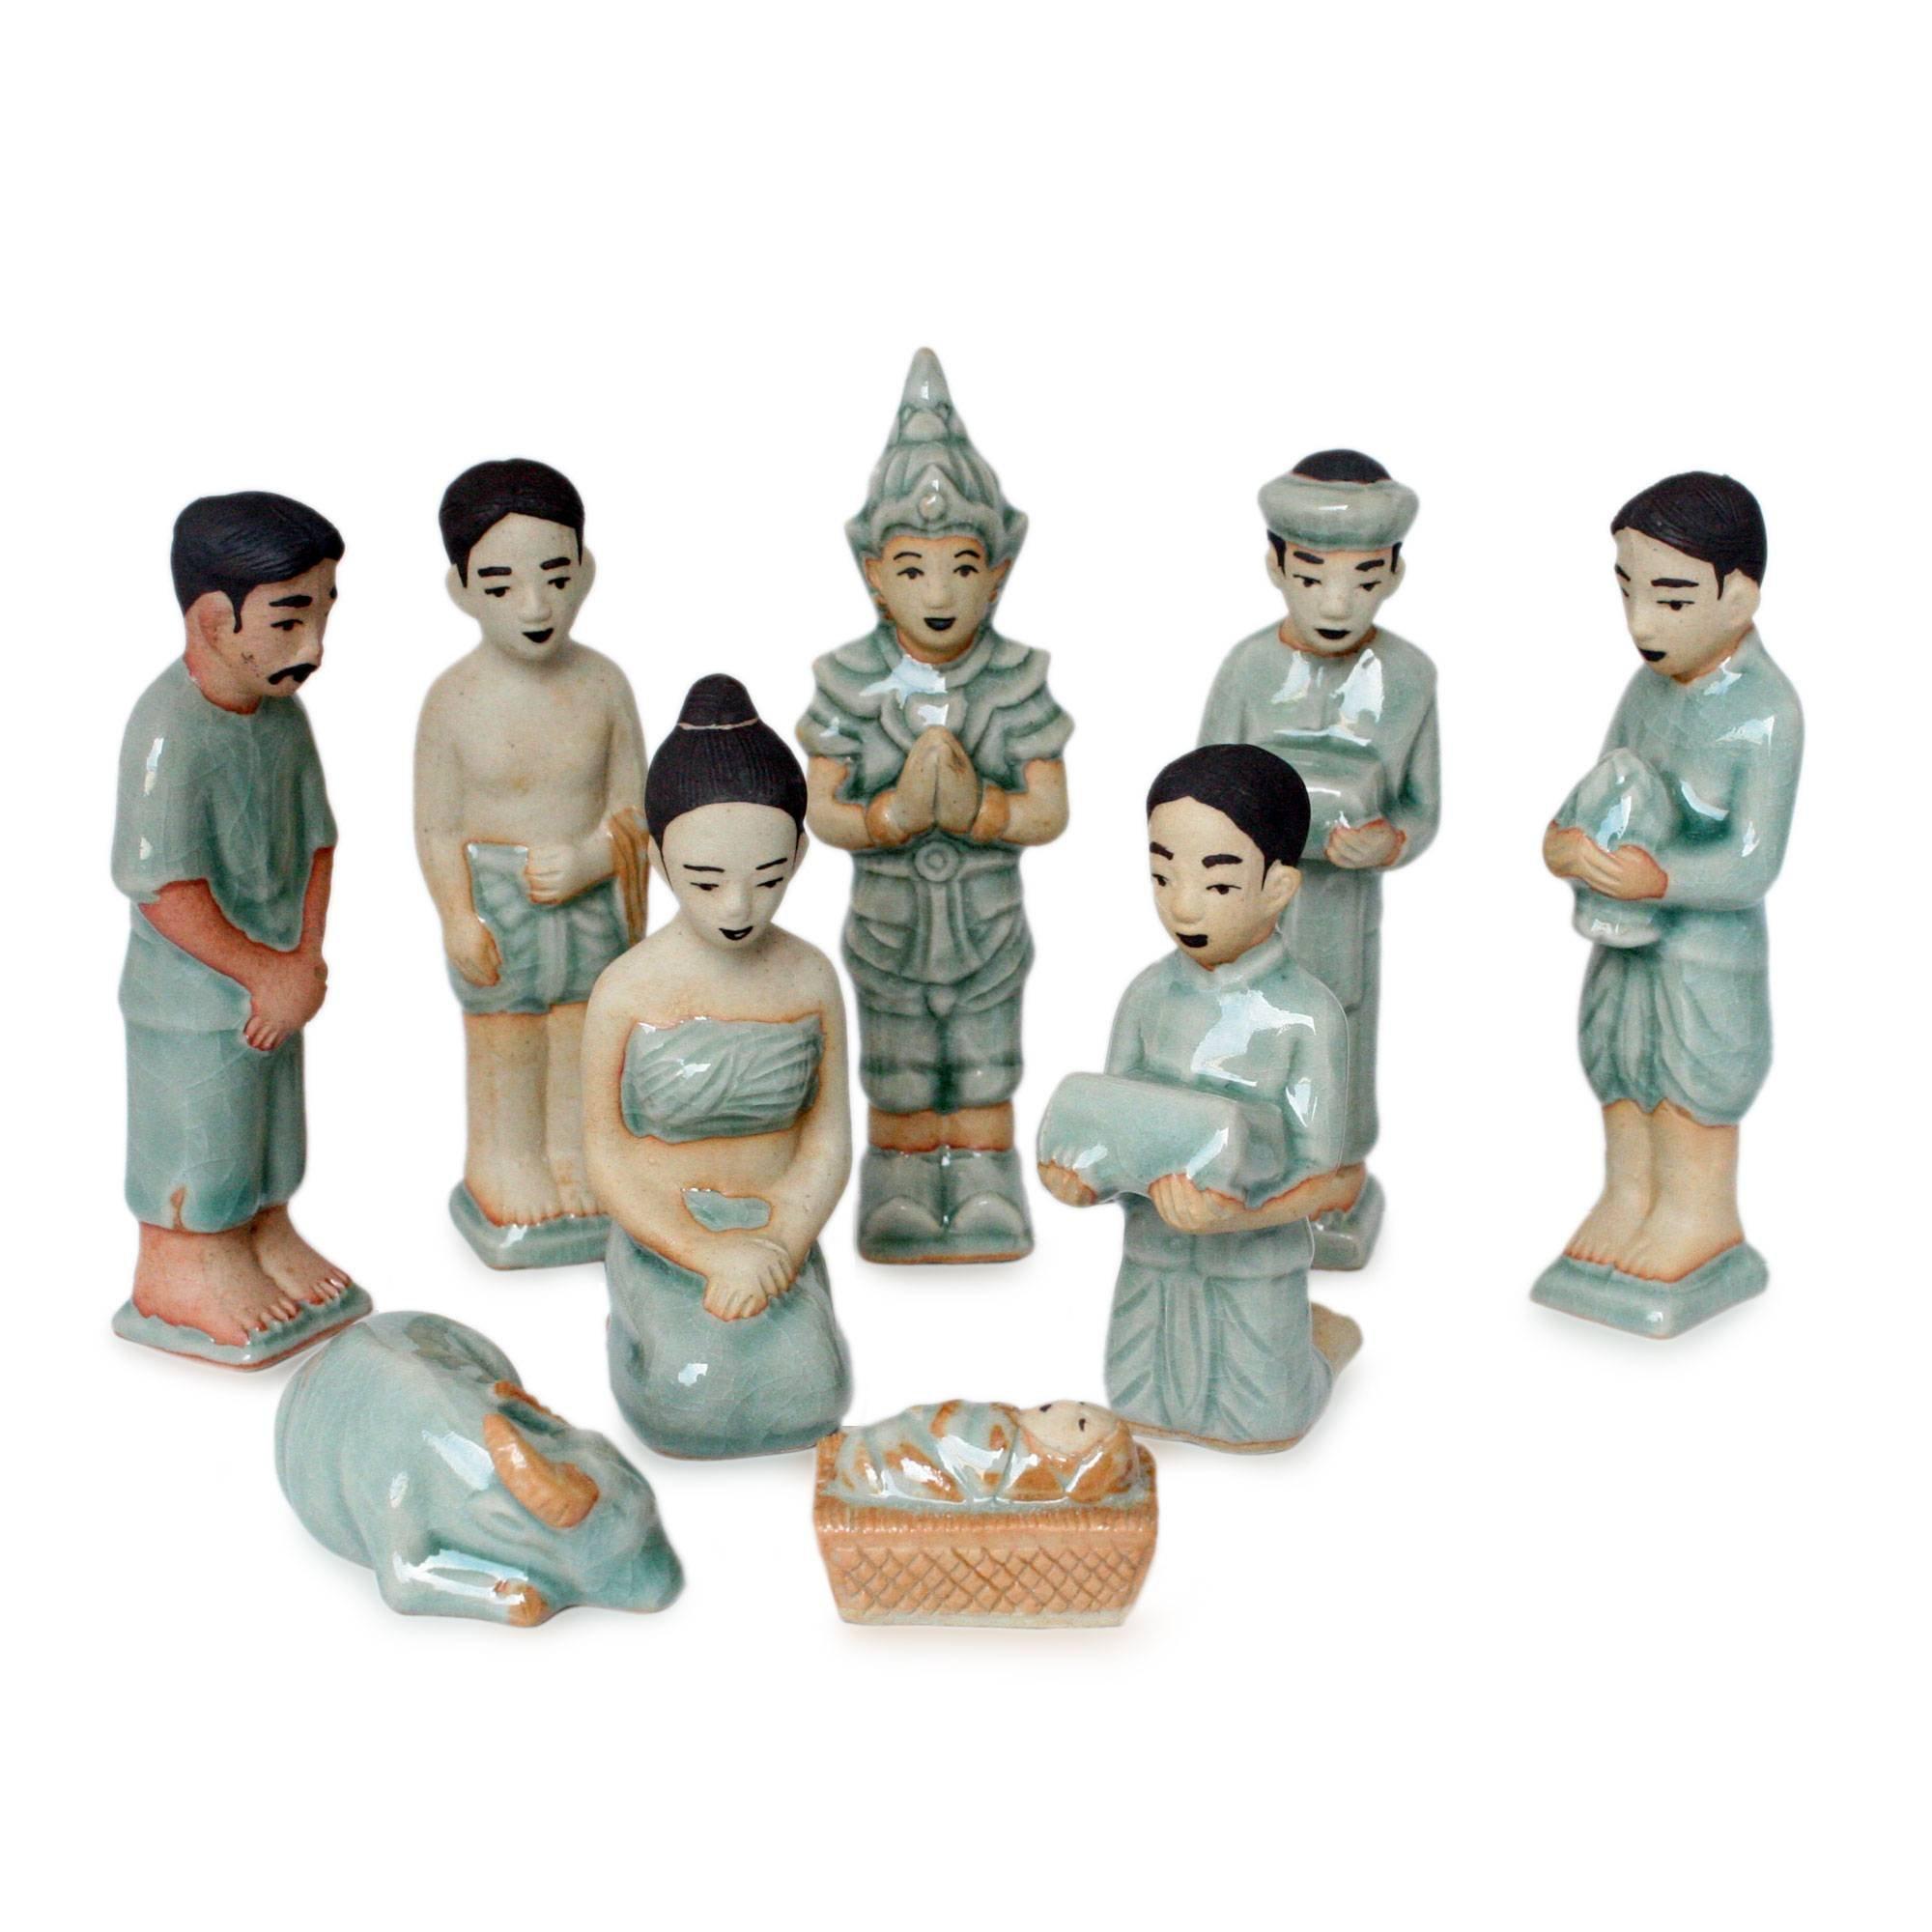 NOVICA Blue Handmade 181675'' Thai Christmas Celadon Ceramic Nativity Scene Figurine, Set of 9